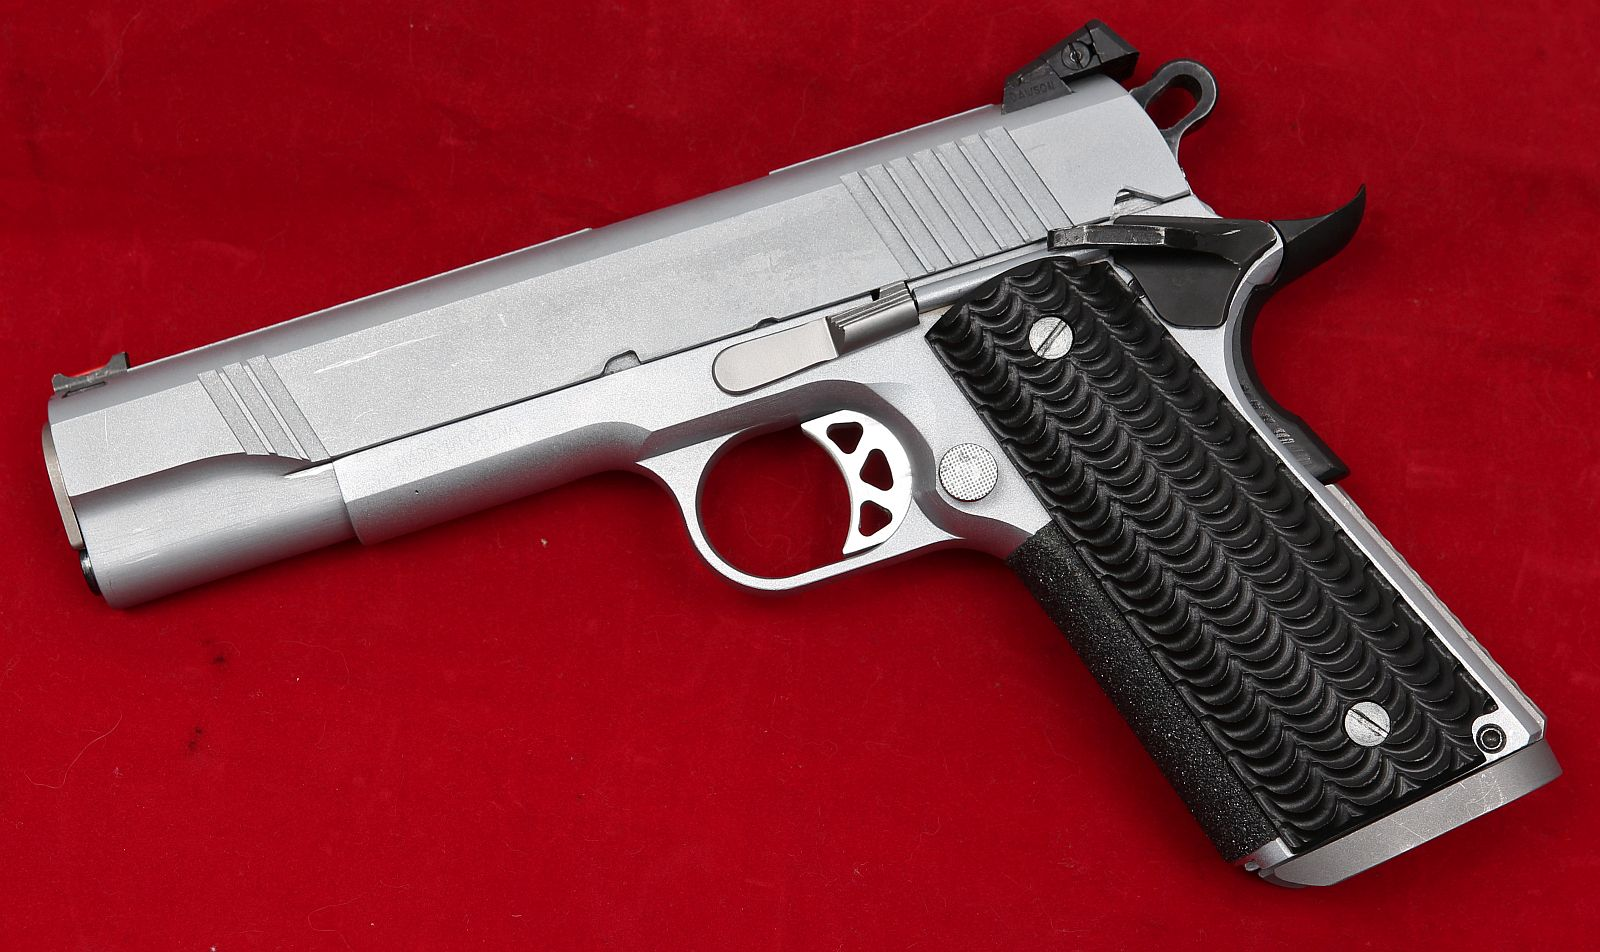 1911 Upgrades for 3 Gun - AKA Polishing a Turd | The Hunting